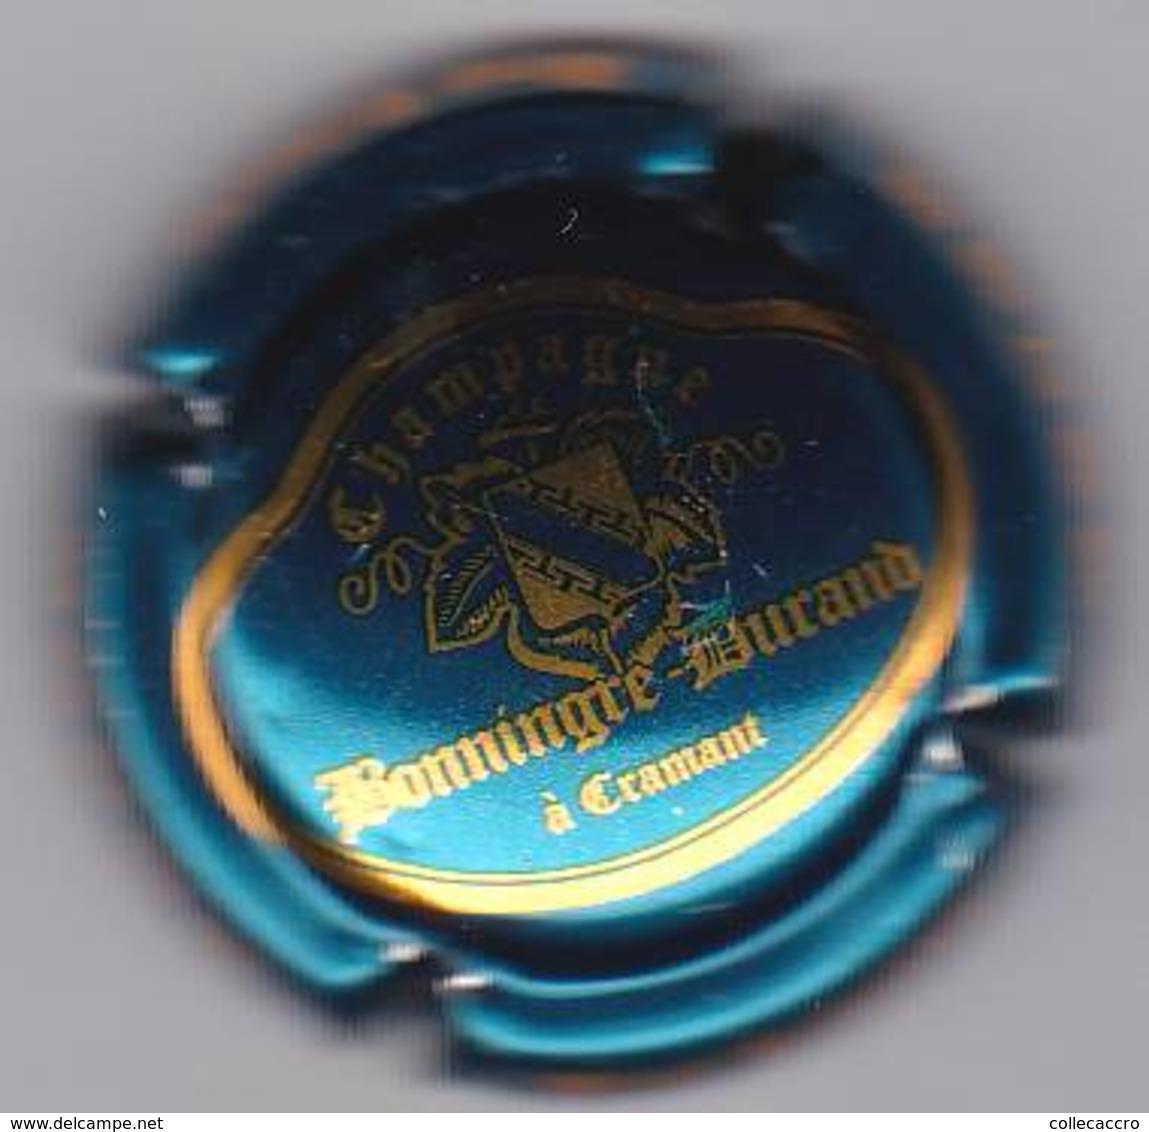 BONNINGRE-DURAND N°31 - Champagne